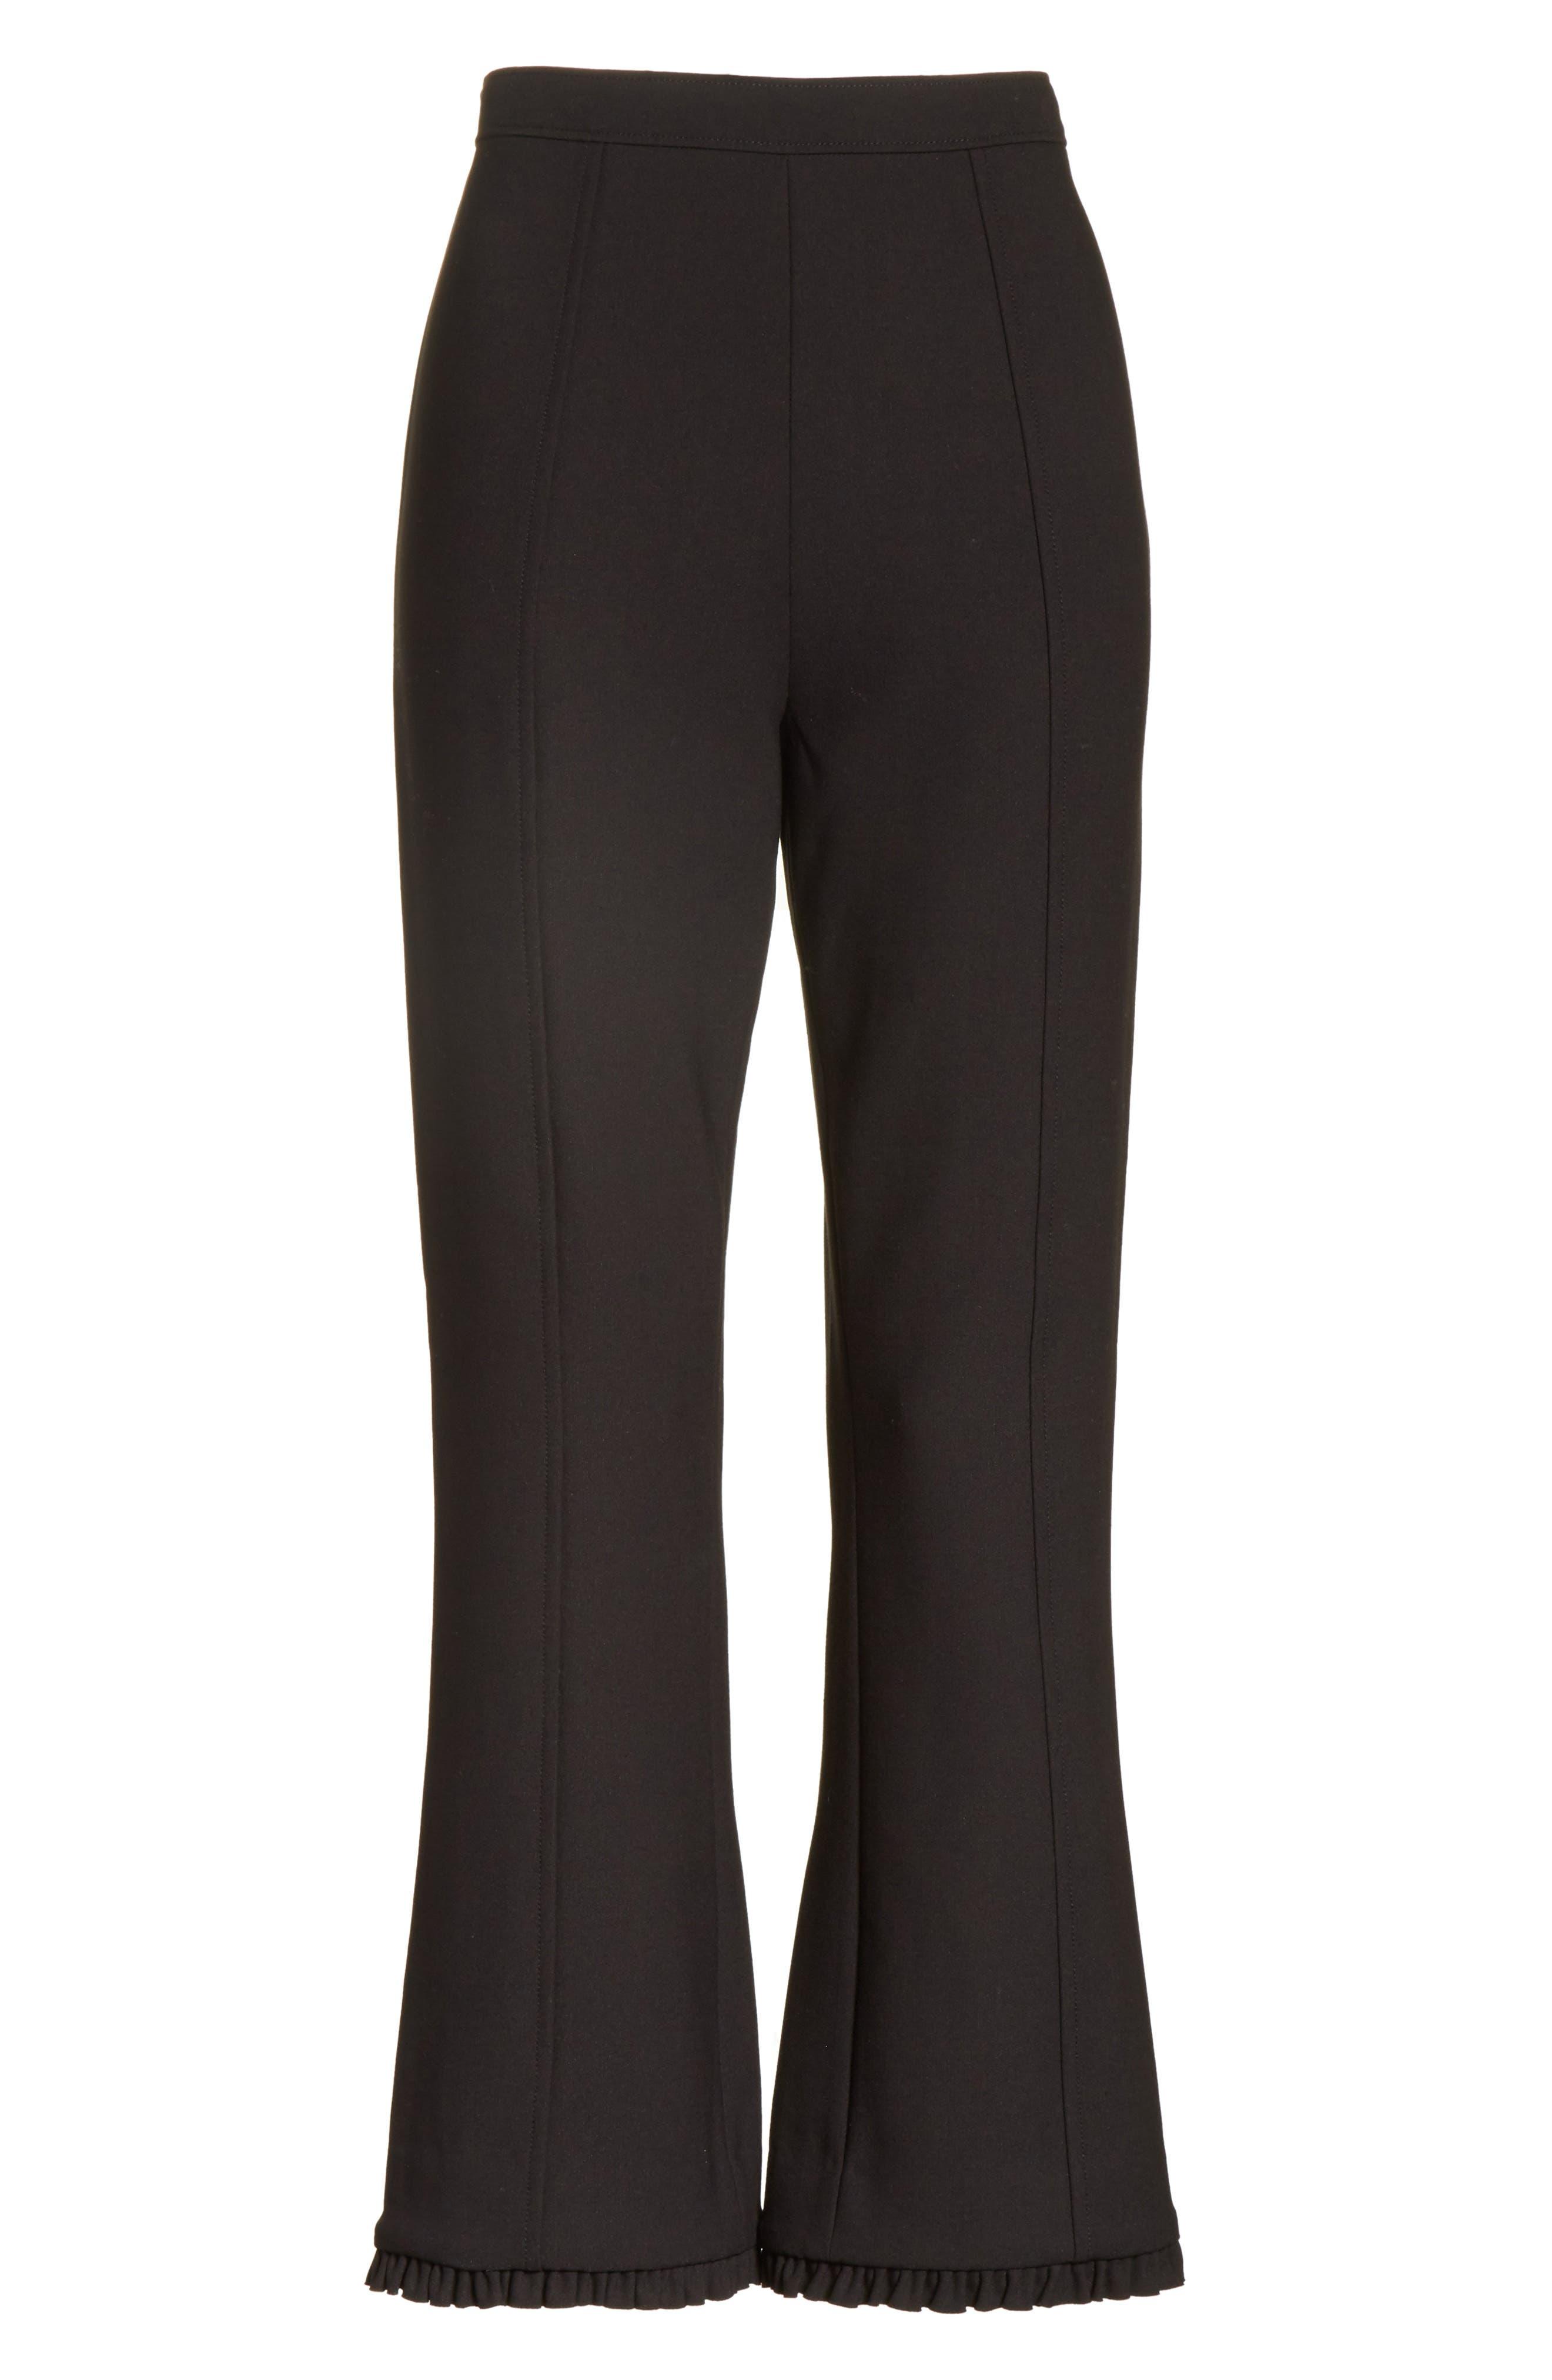 Seneca Flare Leg Crop Pants,                             Alternate thumbnail 6, color,                             Black